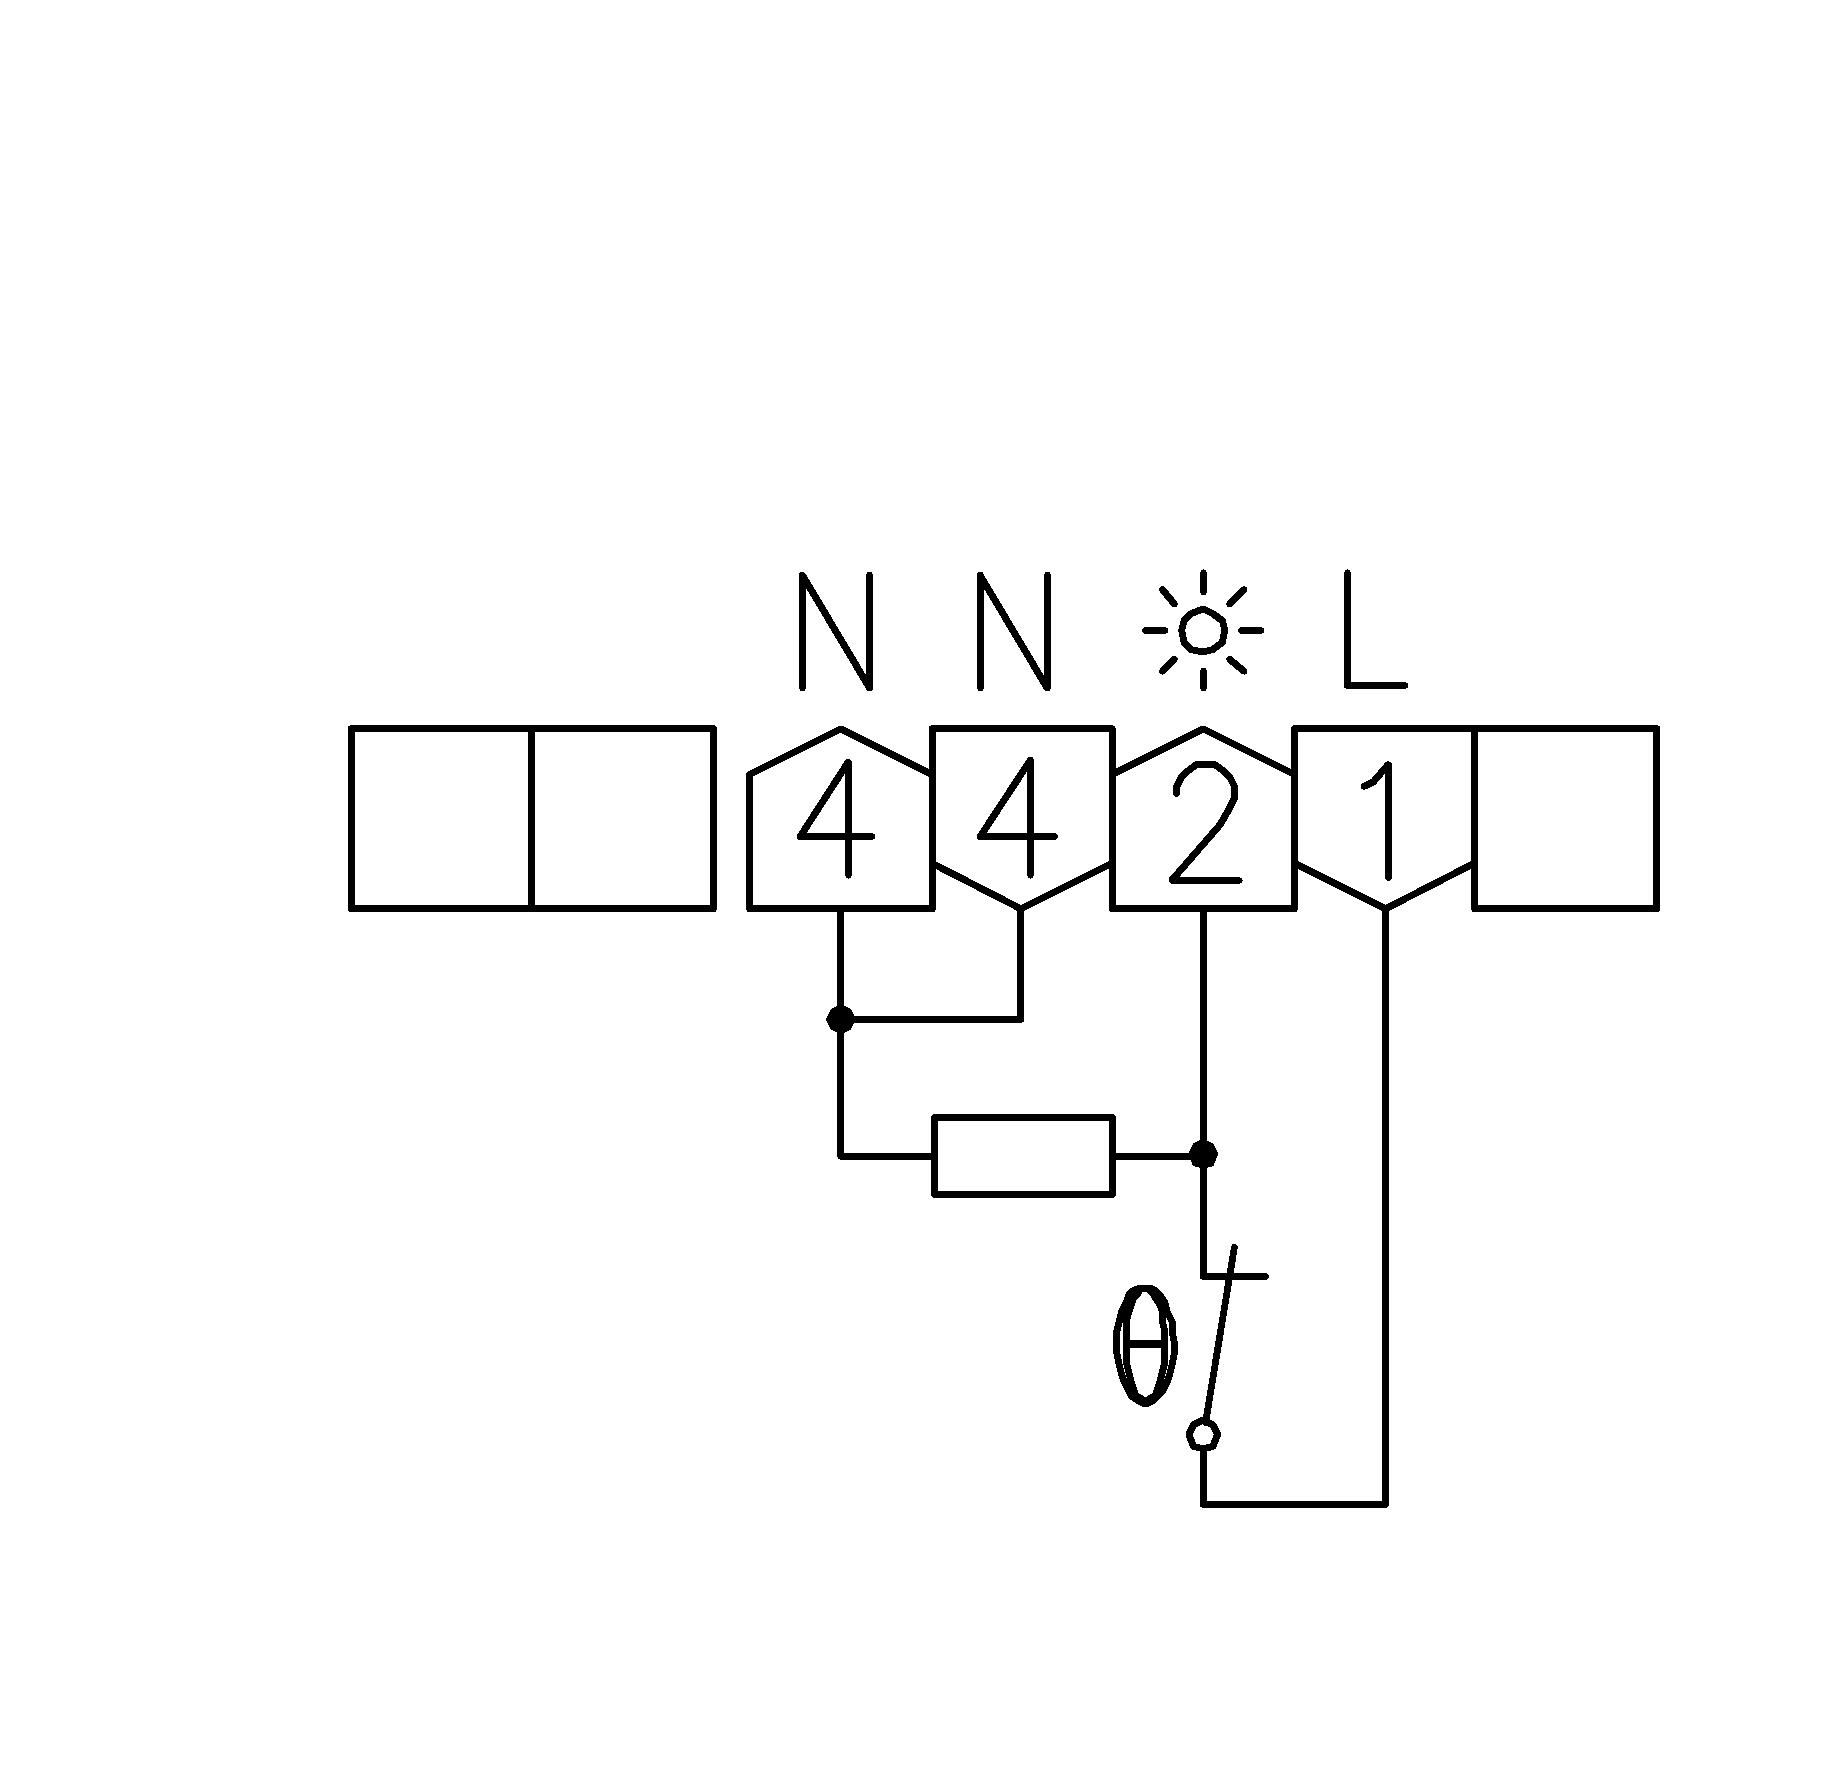 MA010000 Circuit diagram